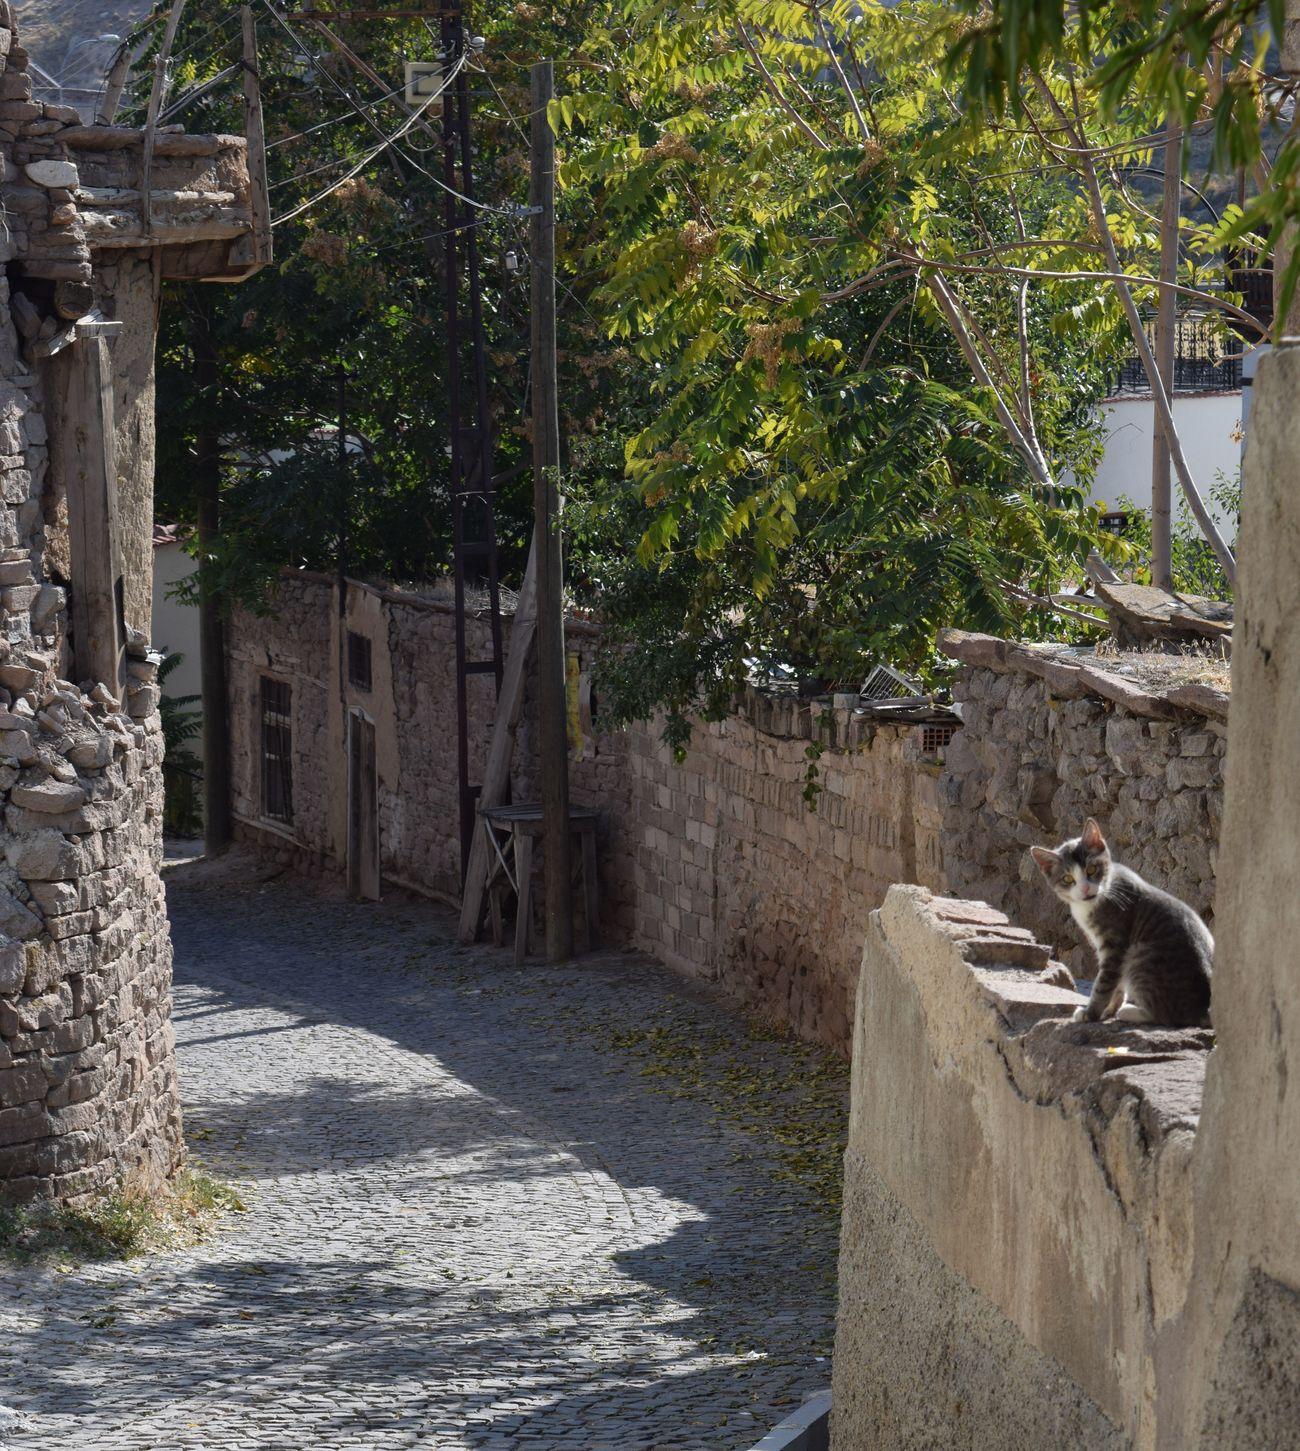 Tree No People Nature Animal Themes Built Structure Day One Animal Cat Outdoors Architecture Konya Konyagram Türkiye